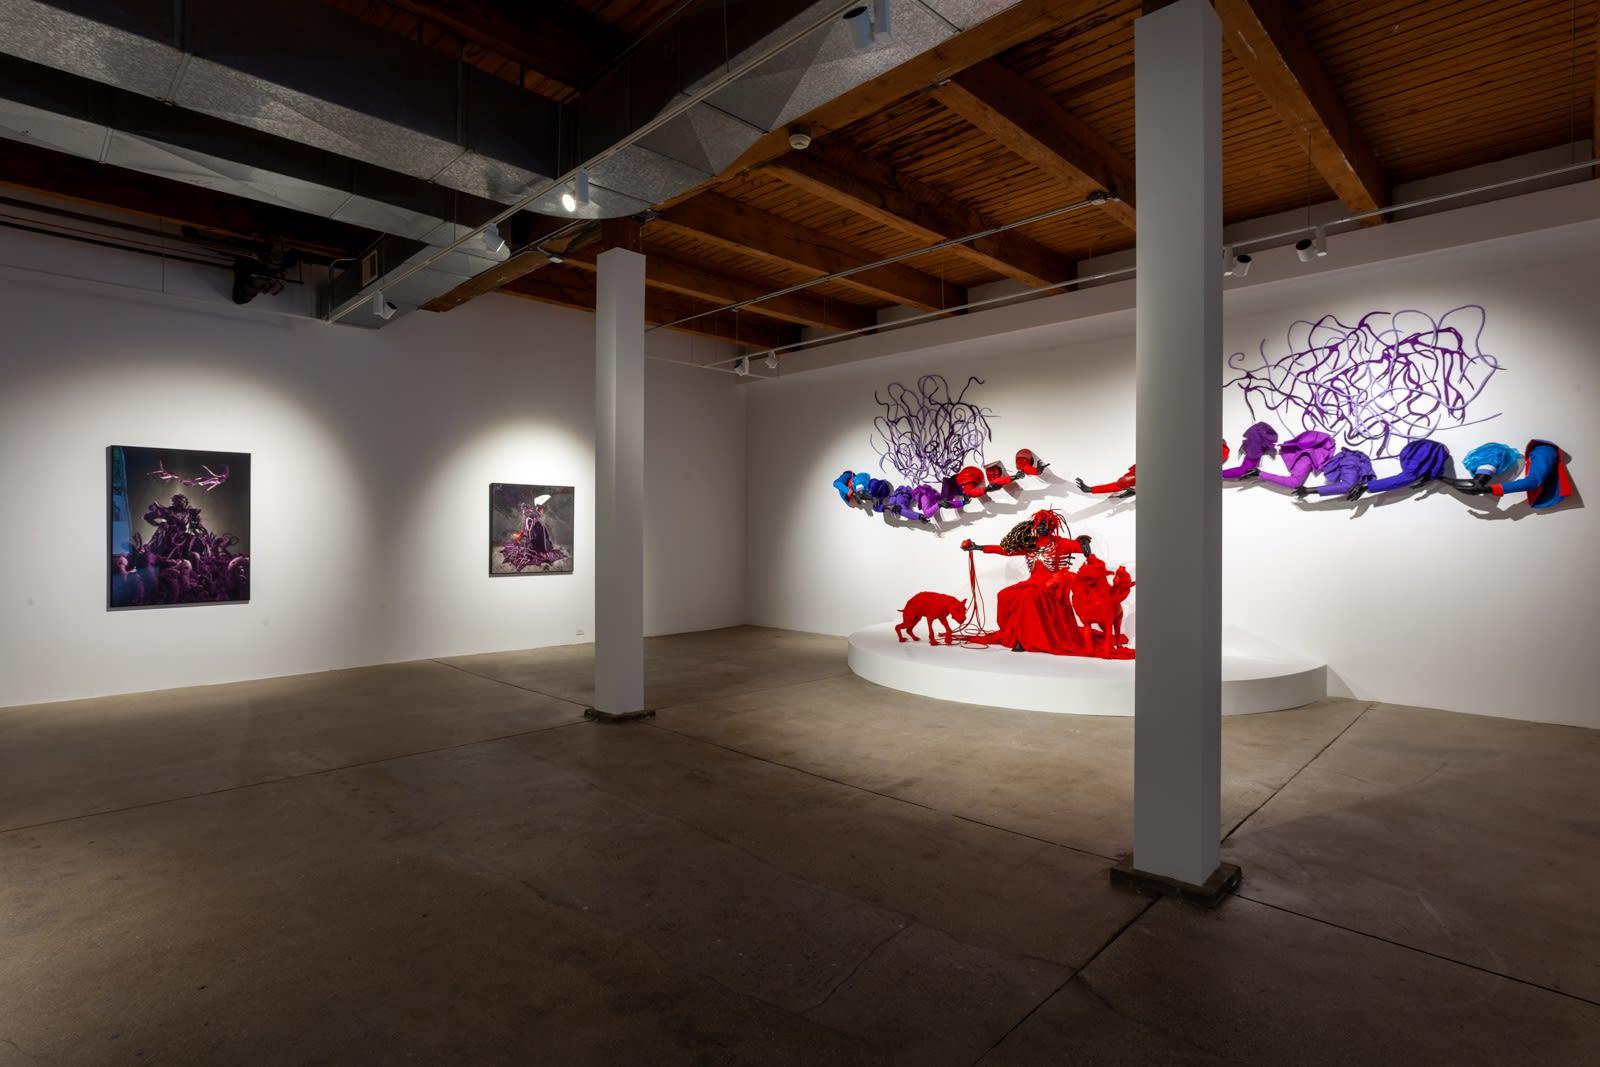 Installation view of Mary Sibande: Unhand Me, Demon!, Kavi Gupta   Washington Blvd., Chicago, 2021